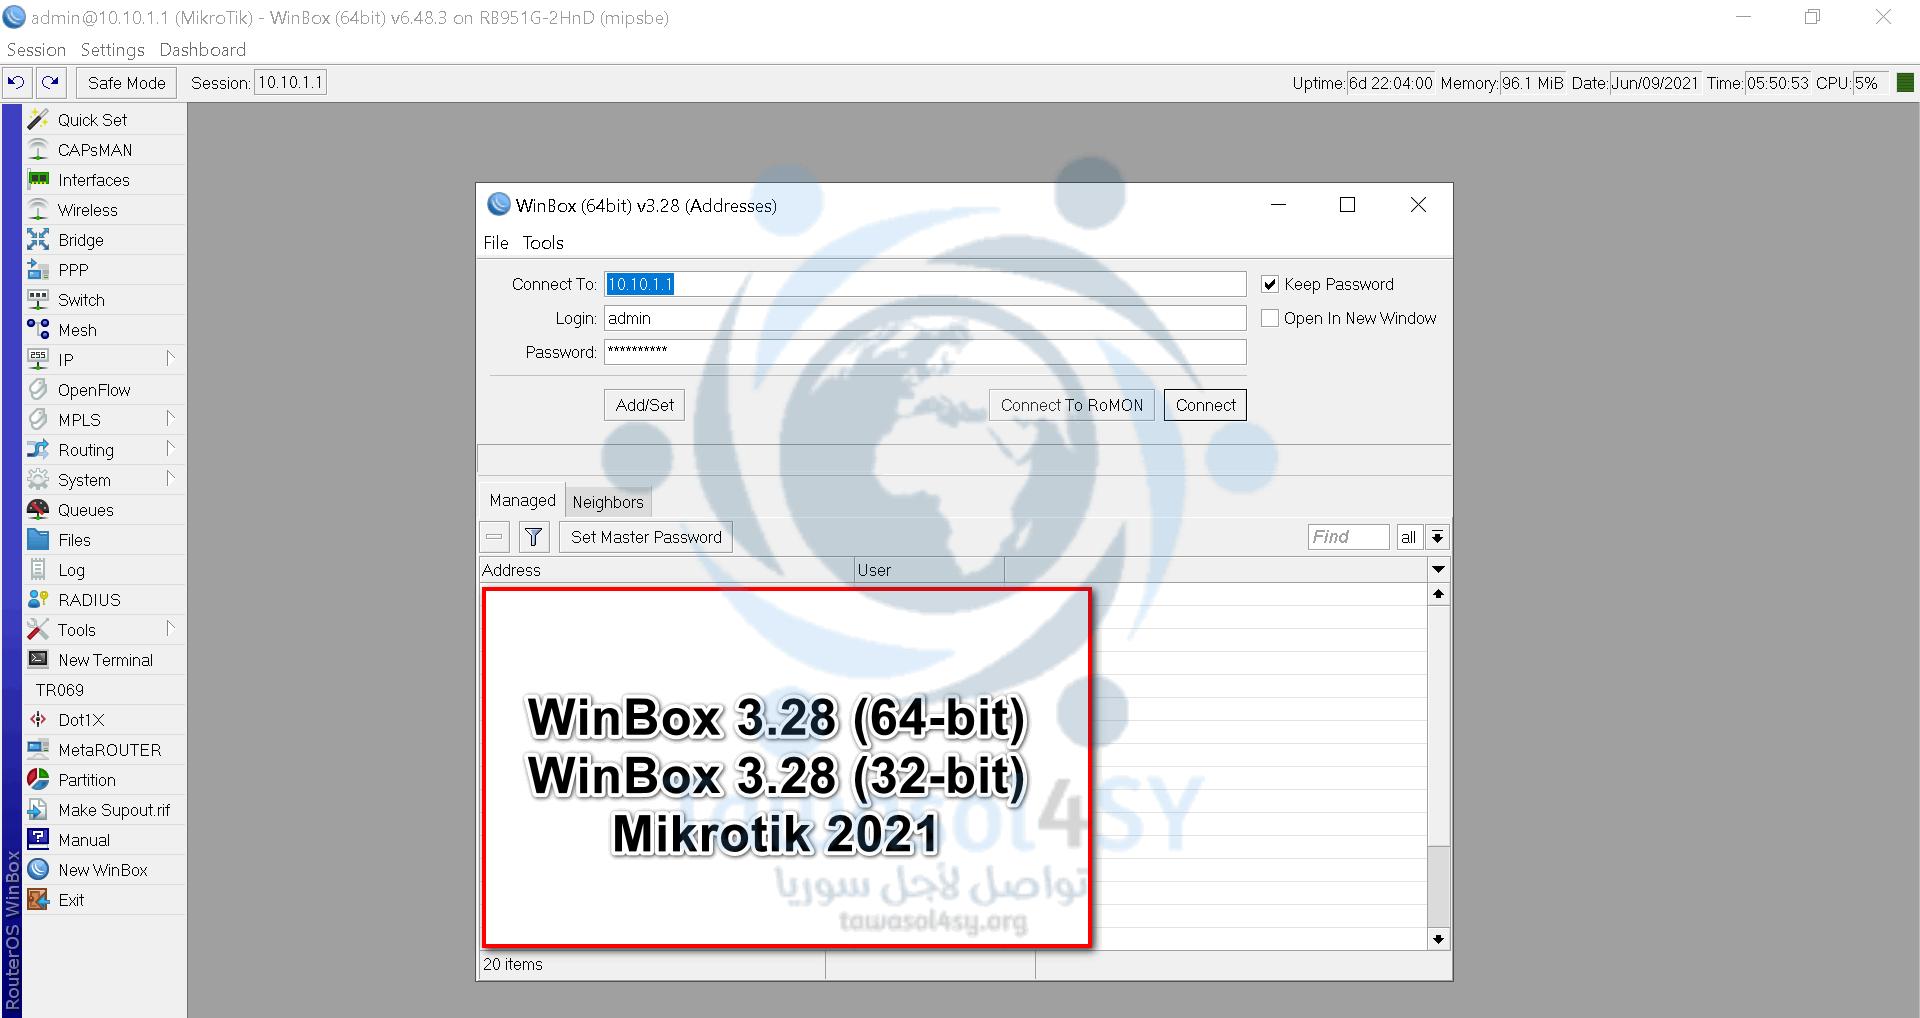 WinBox 3.28 (64-bit) WinBox 3.28 (32-bit)